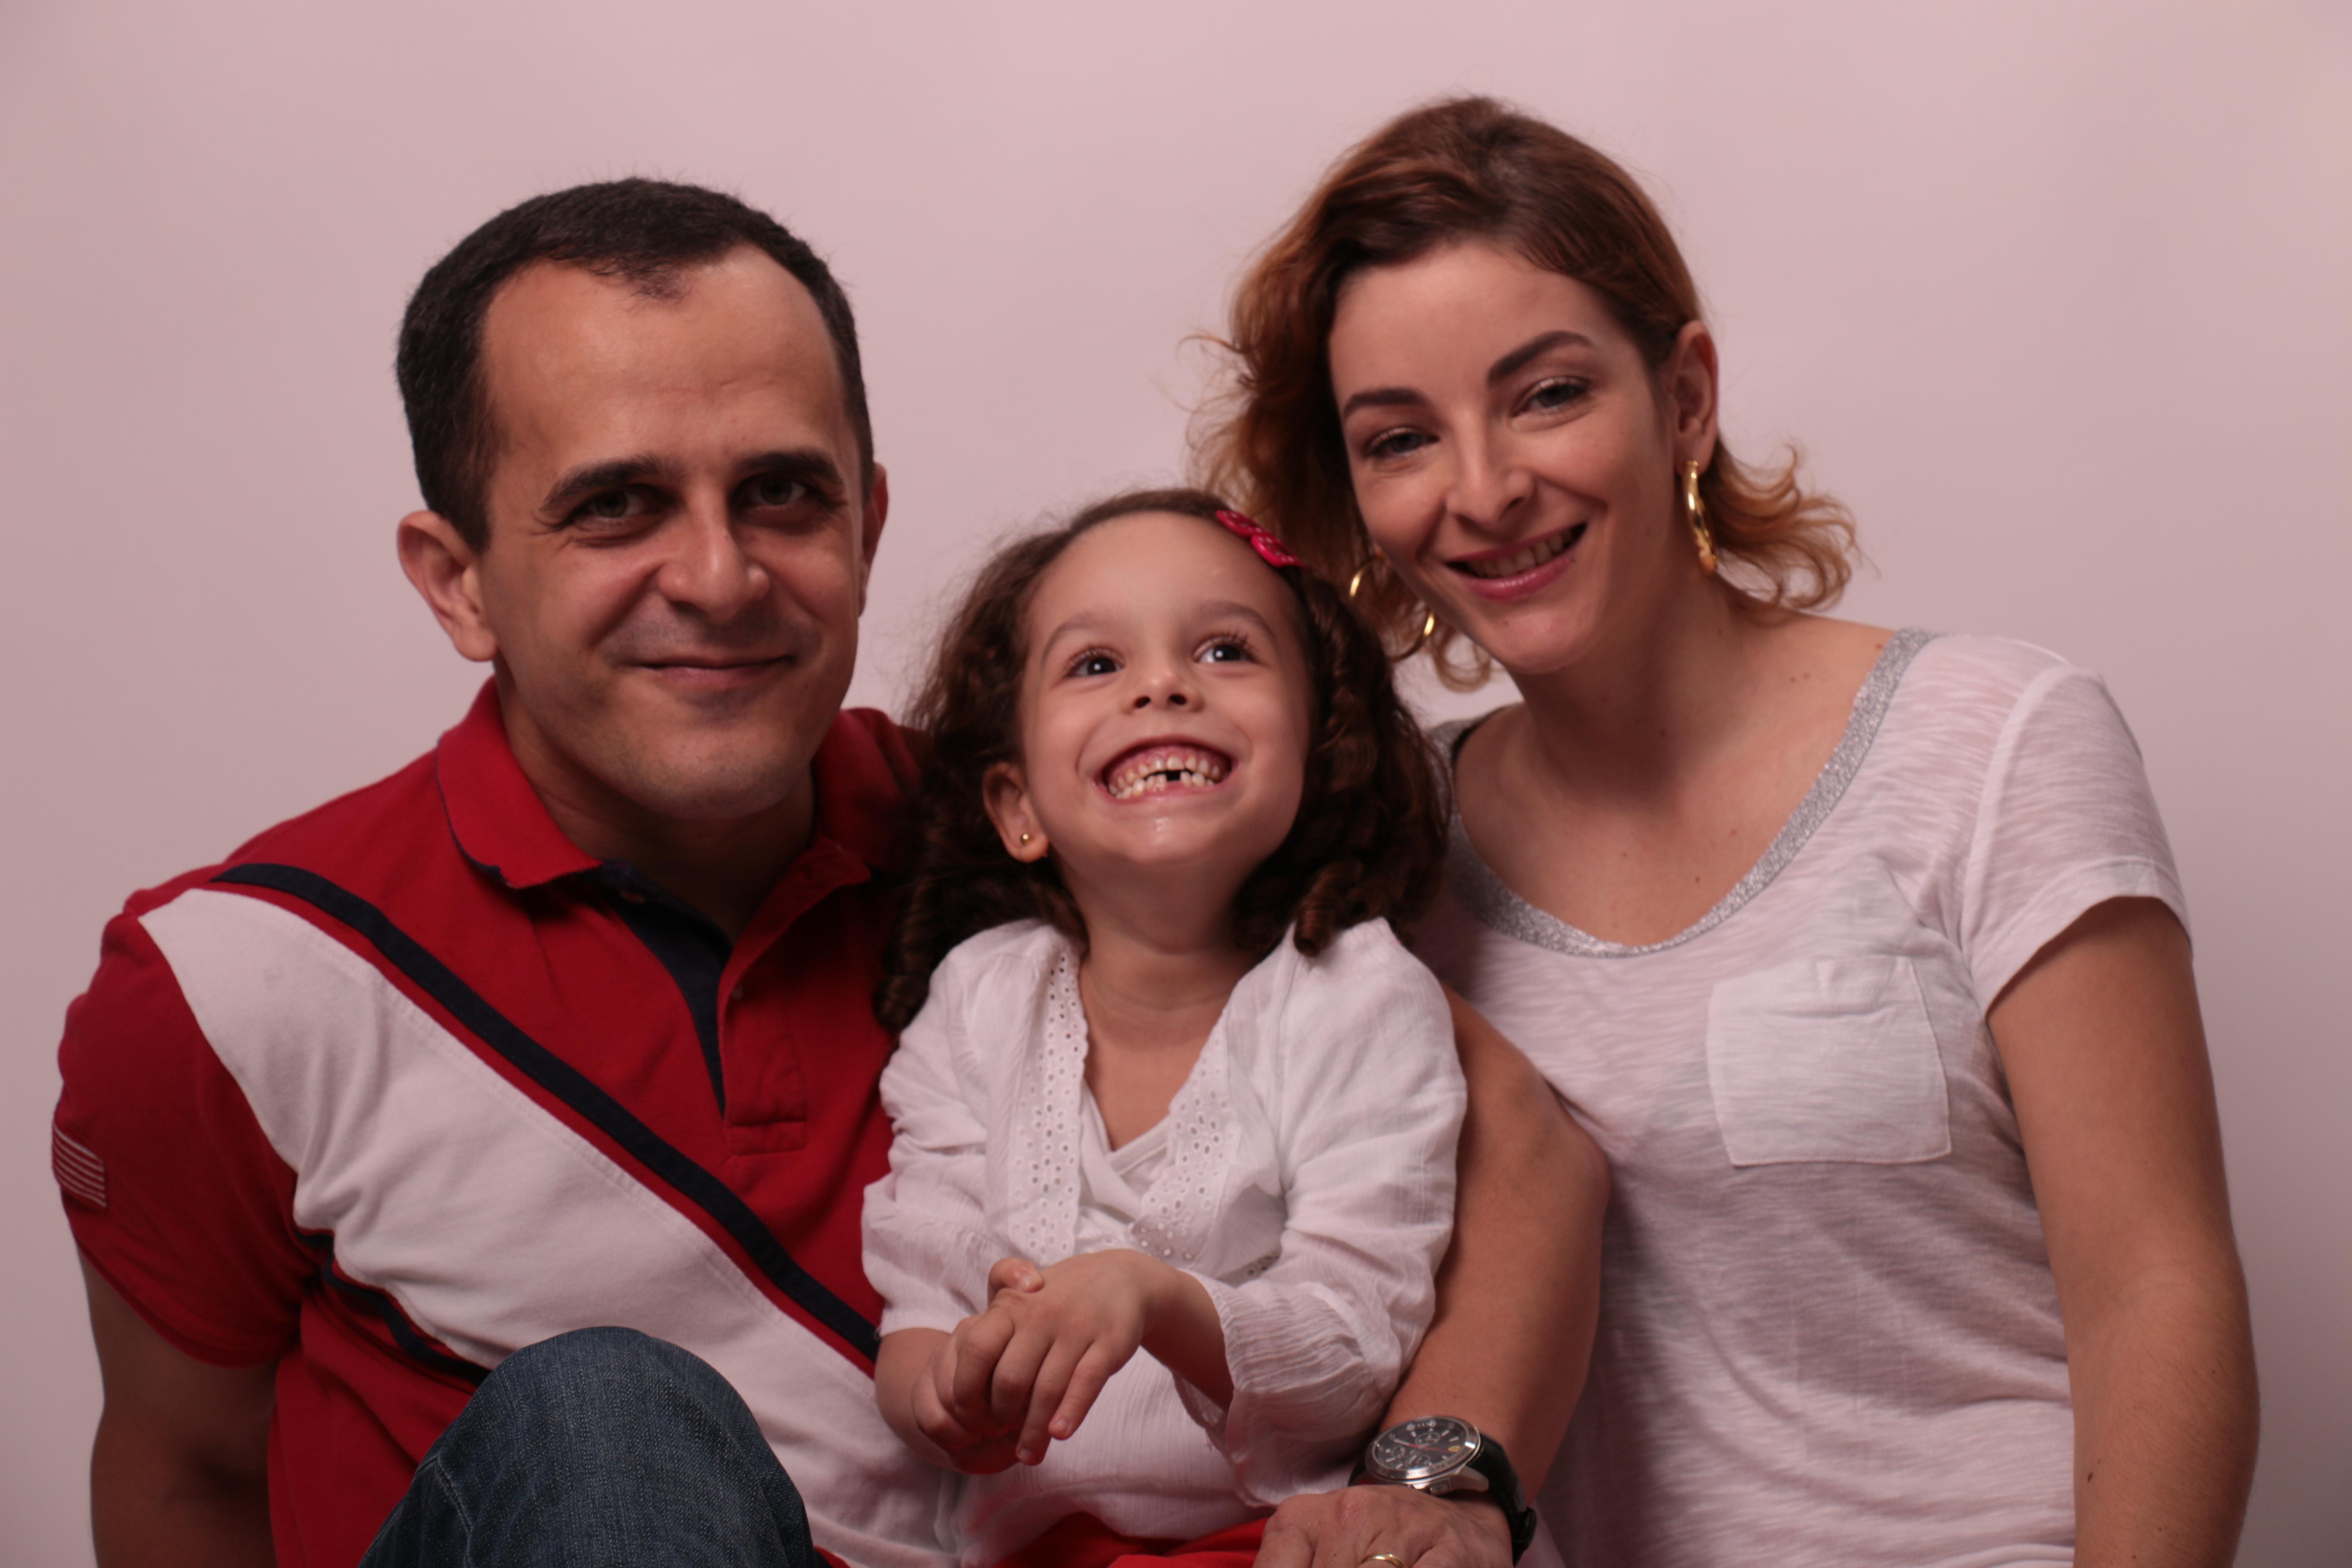 The Pereira family from left to right: Carlos, Clara, and Aline. Photo from Livox